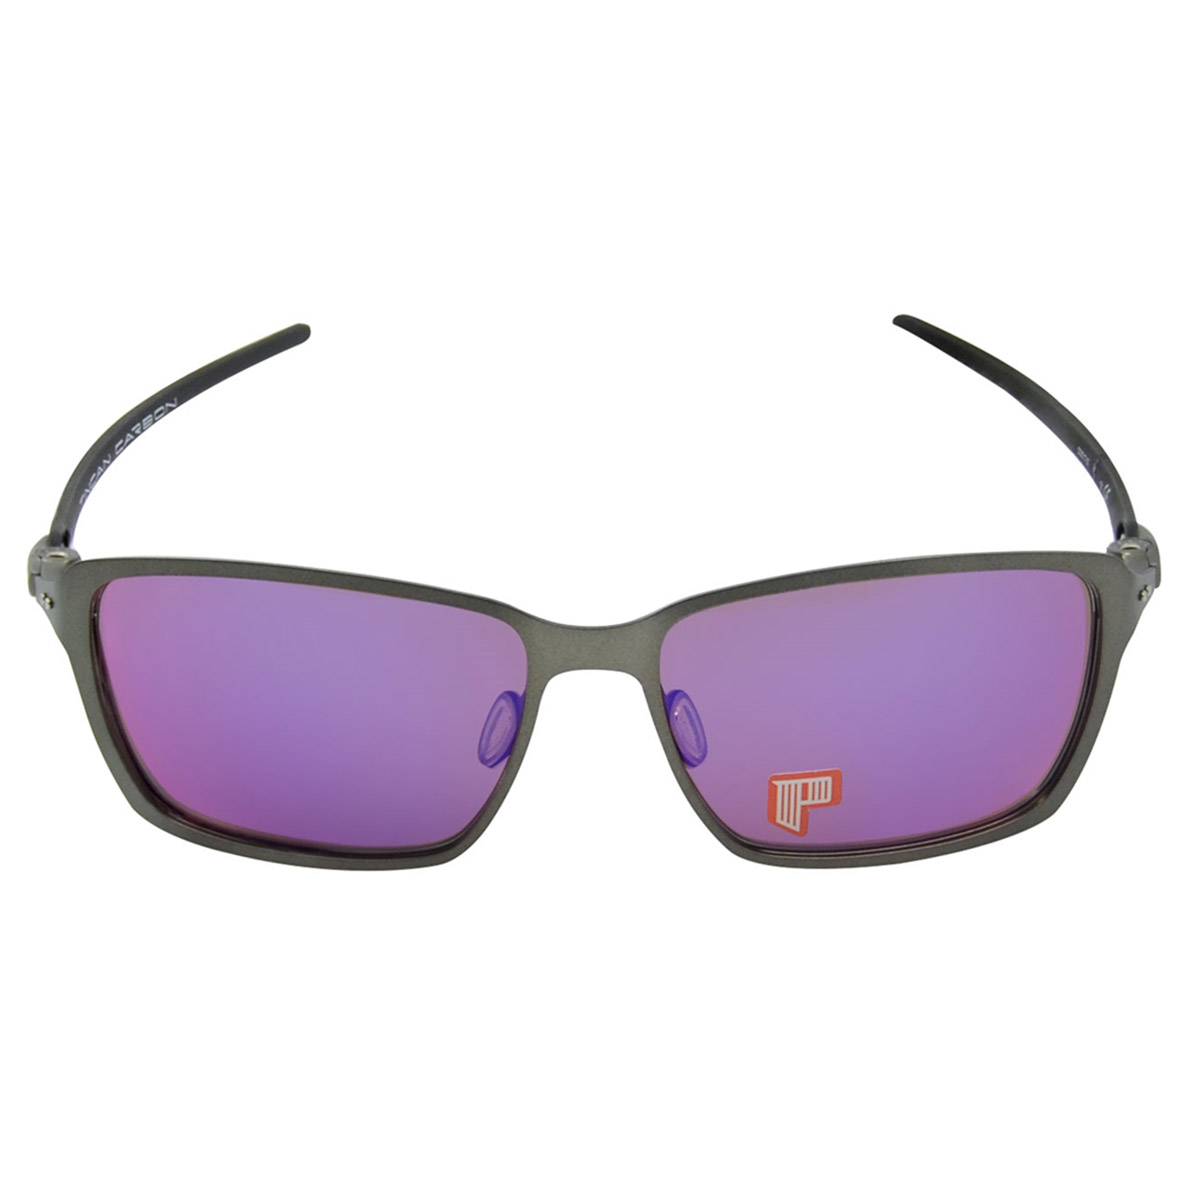 6aa2572f4ffcf Óculos Oakley Tincan Carbon Lente Red Iridium Polarizado ref OO6017-03